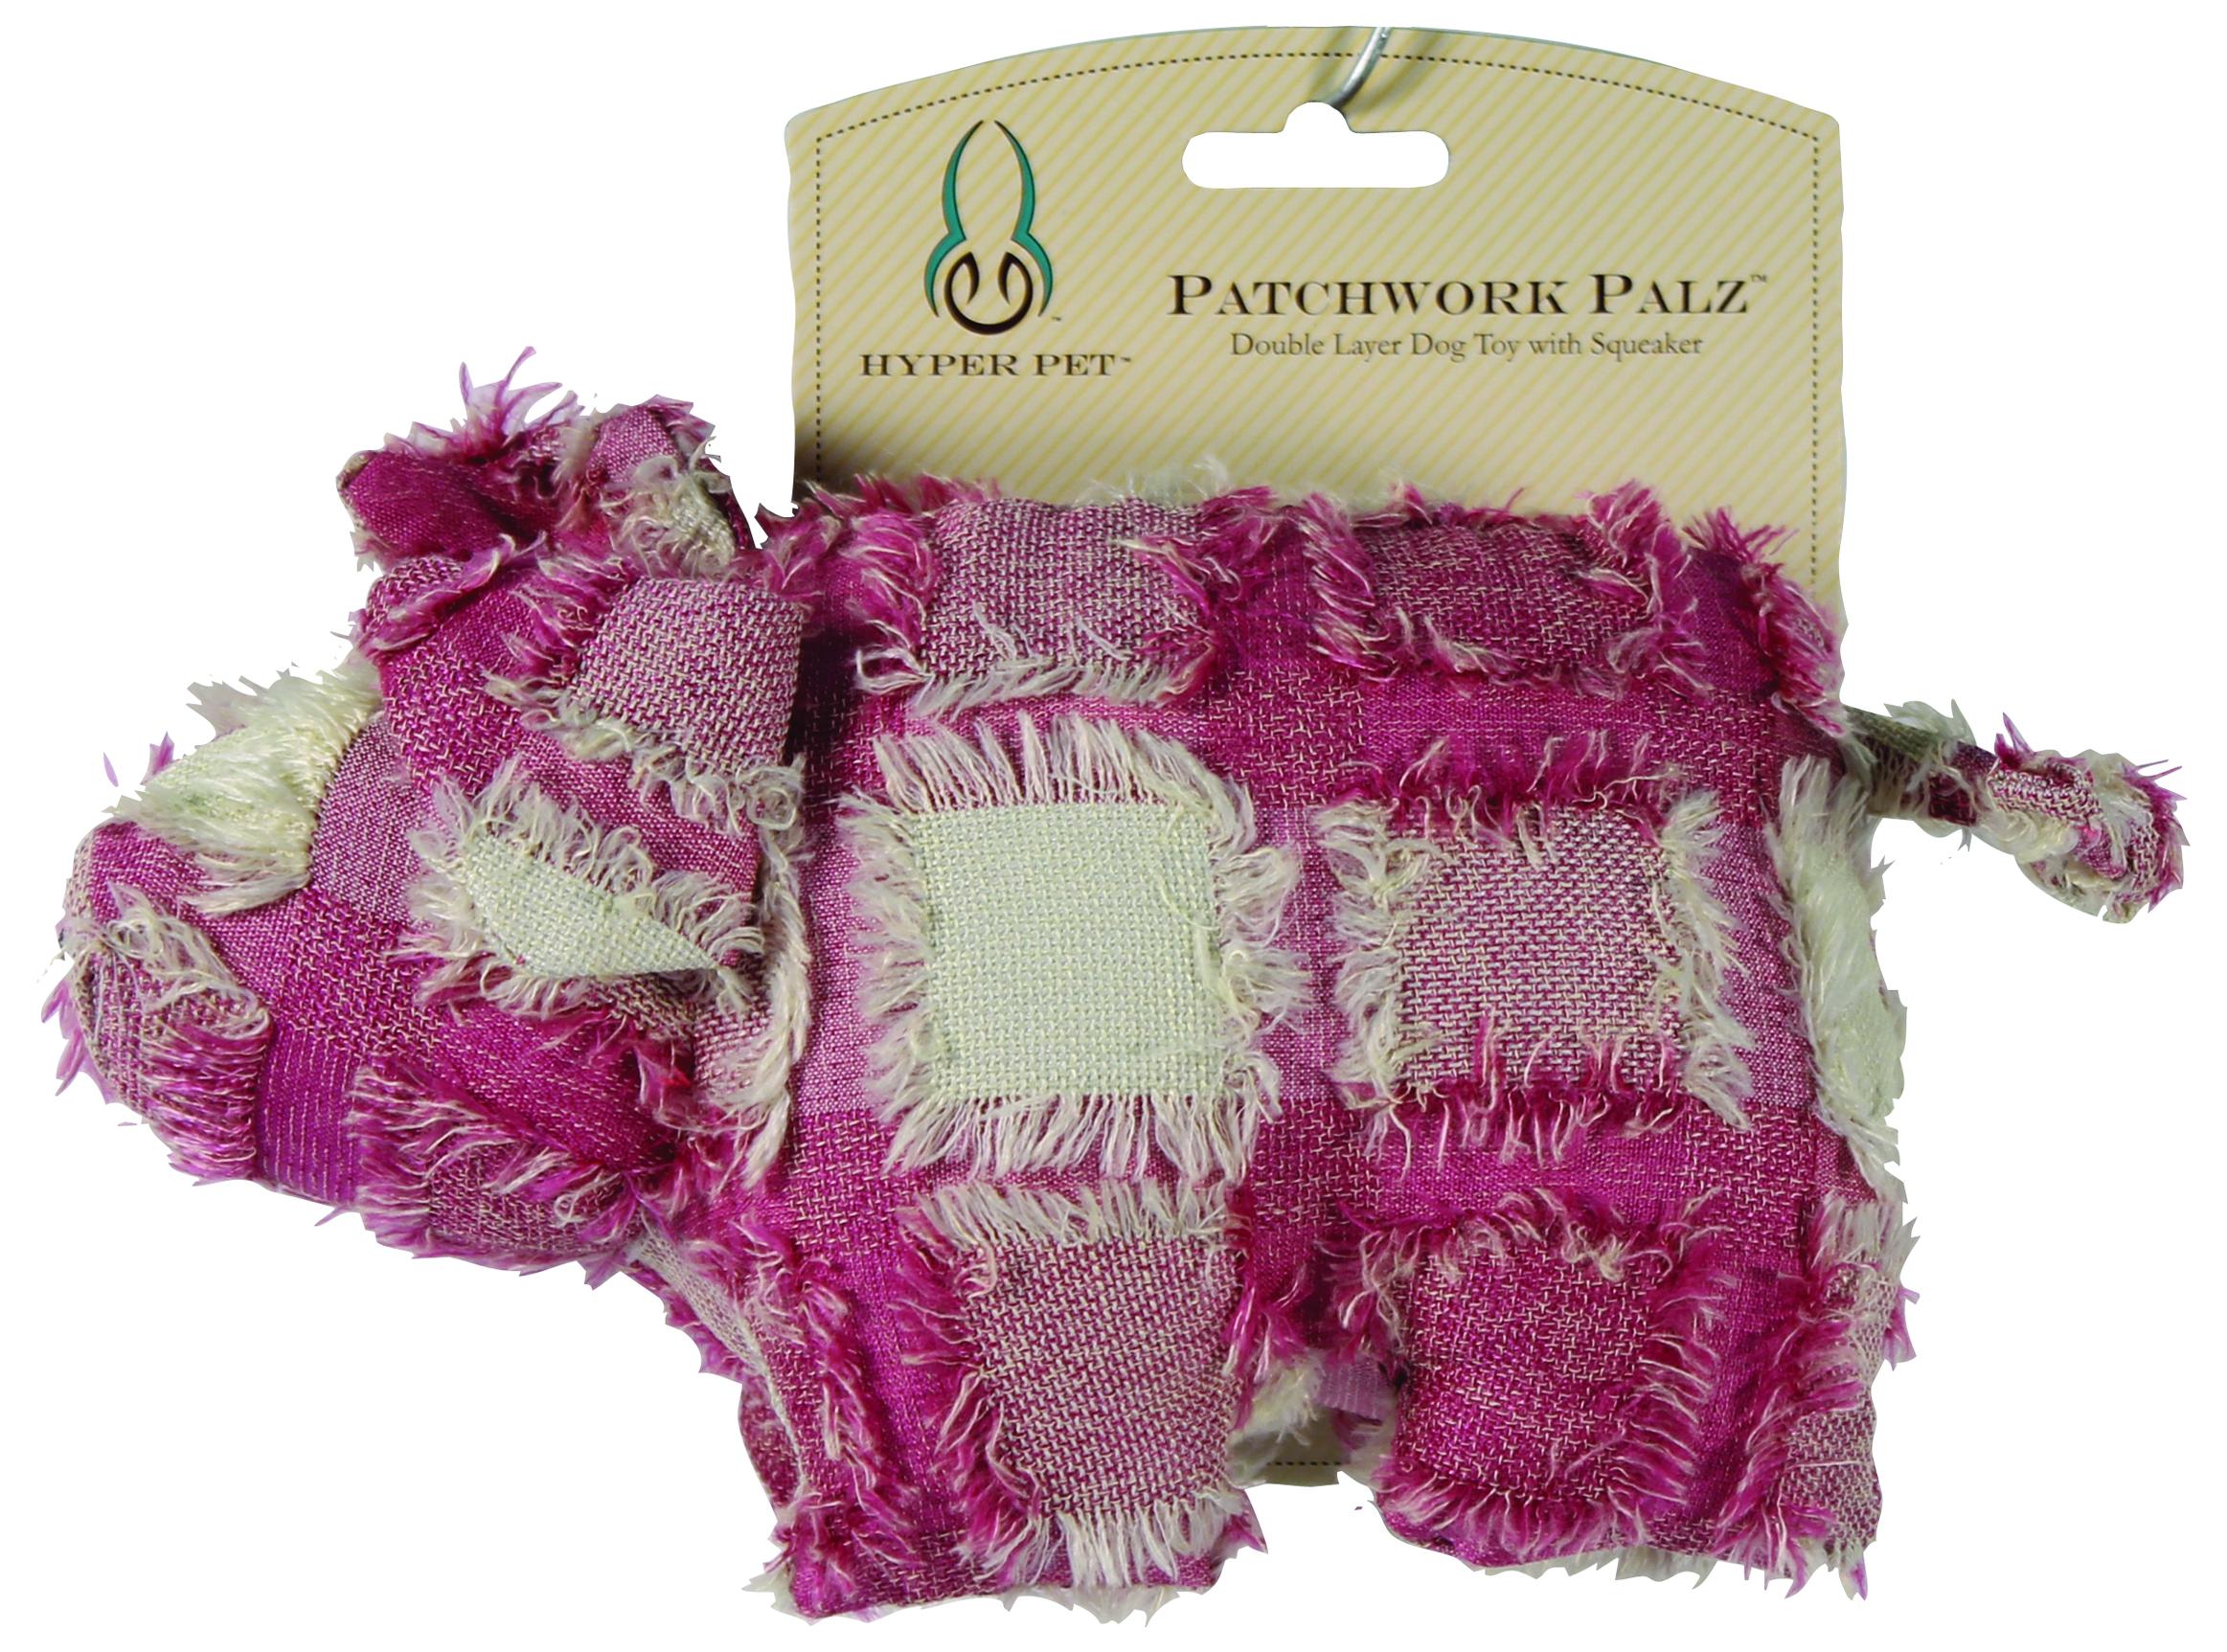 Hyper Pet Patchwork Palz Pig with Squeaker